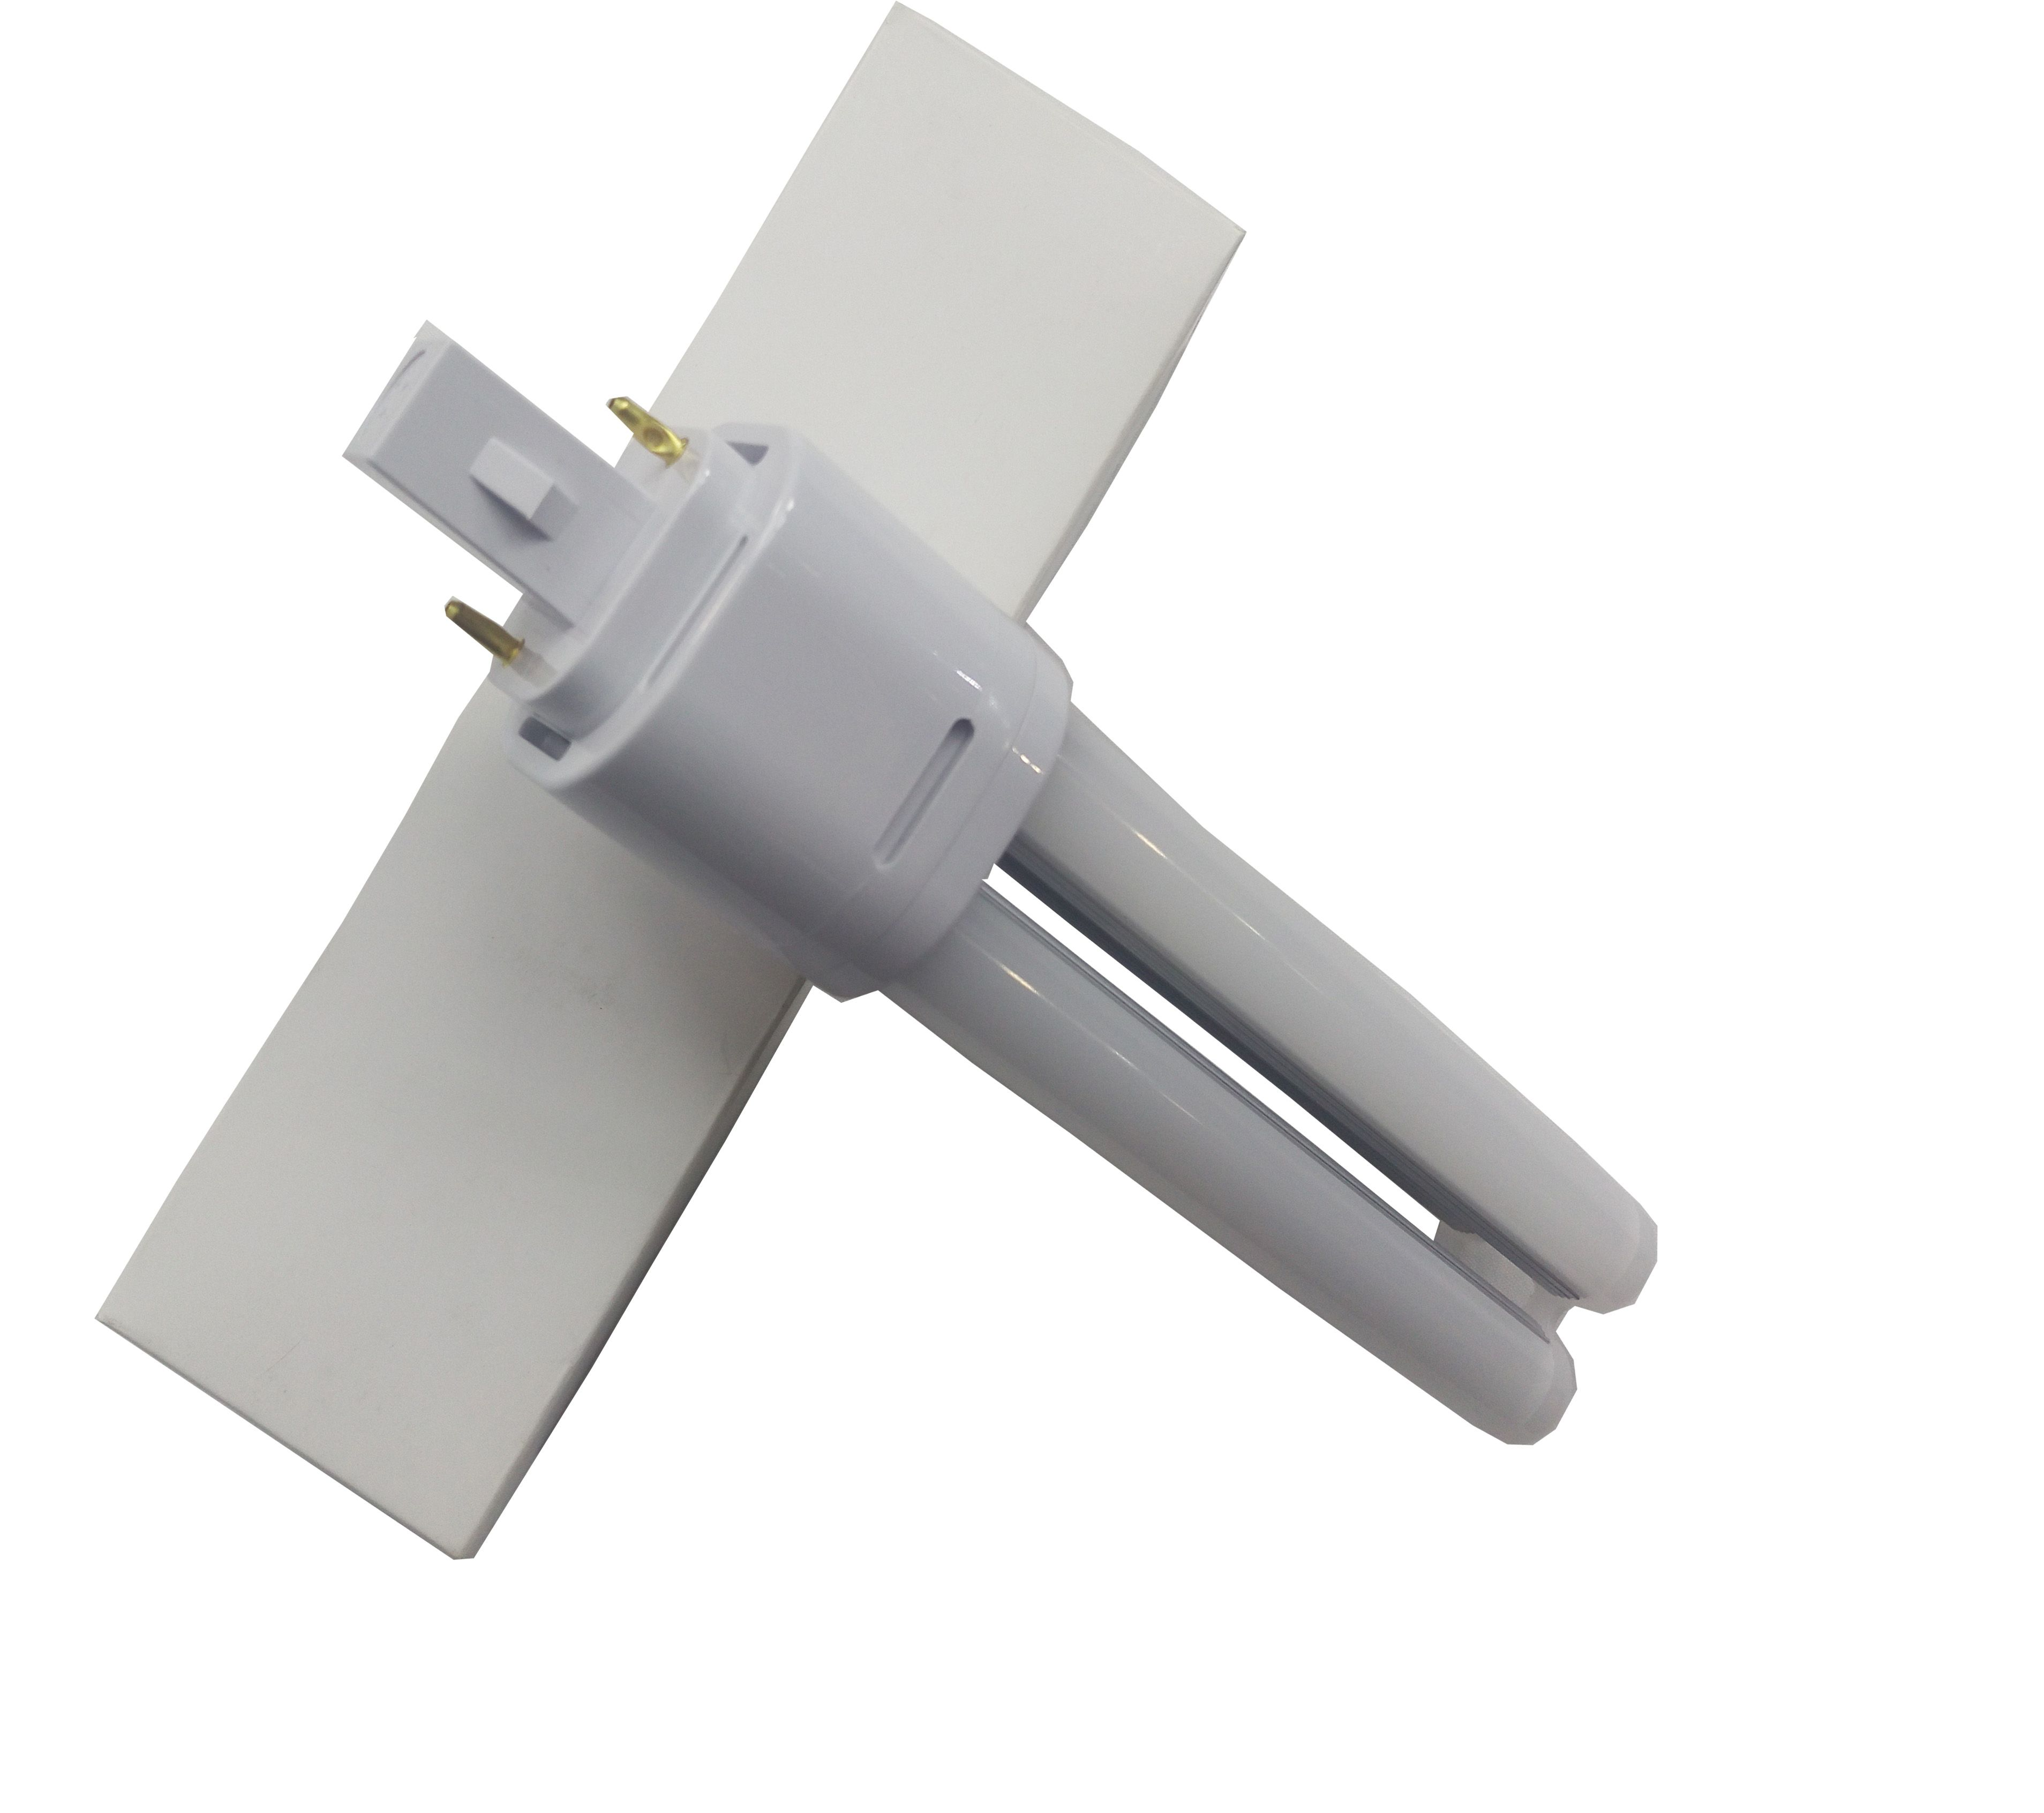 Led Retrofits 360 Degree Pl Lamp High Cri Lamp Led Can Opener